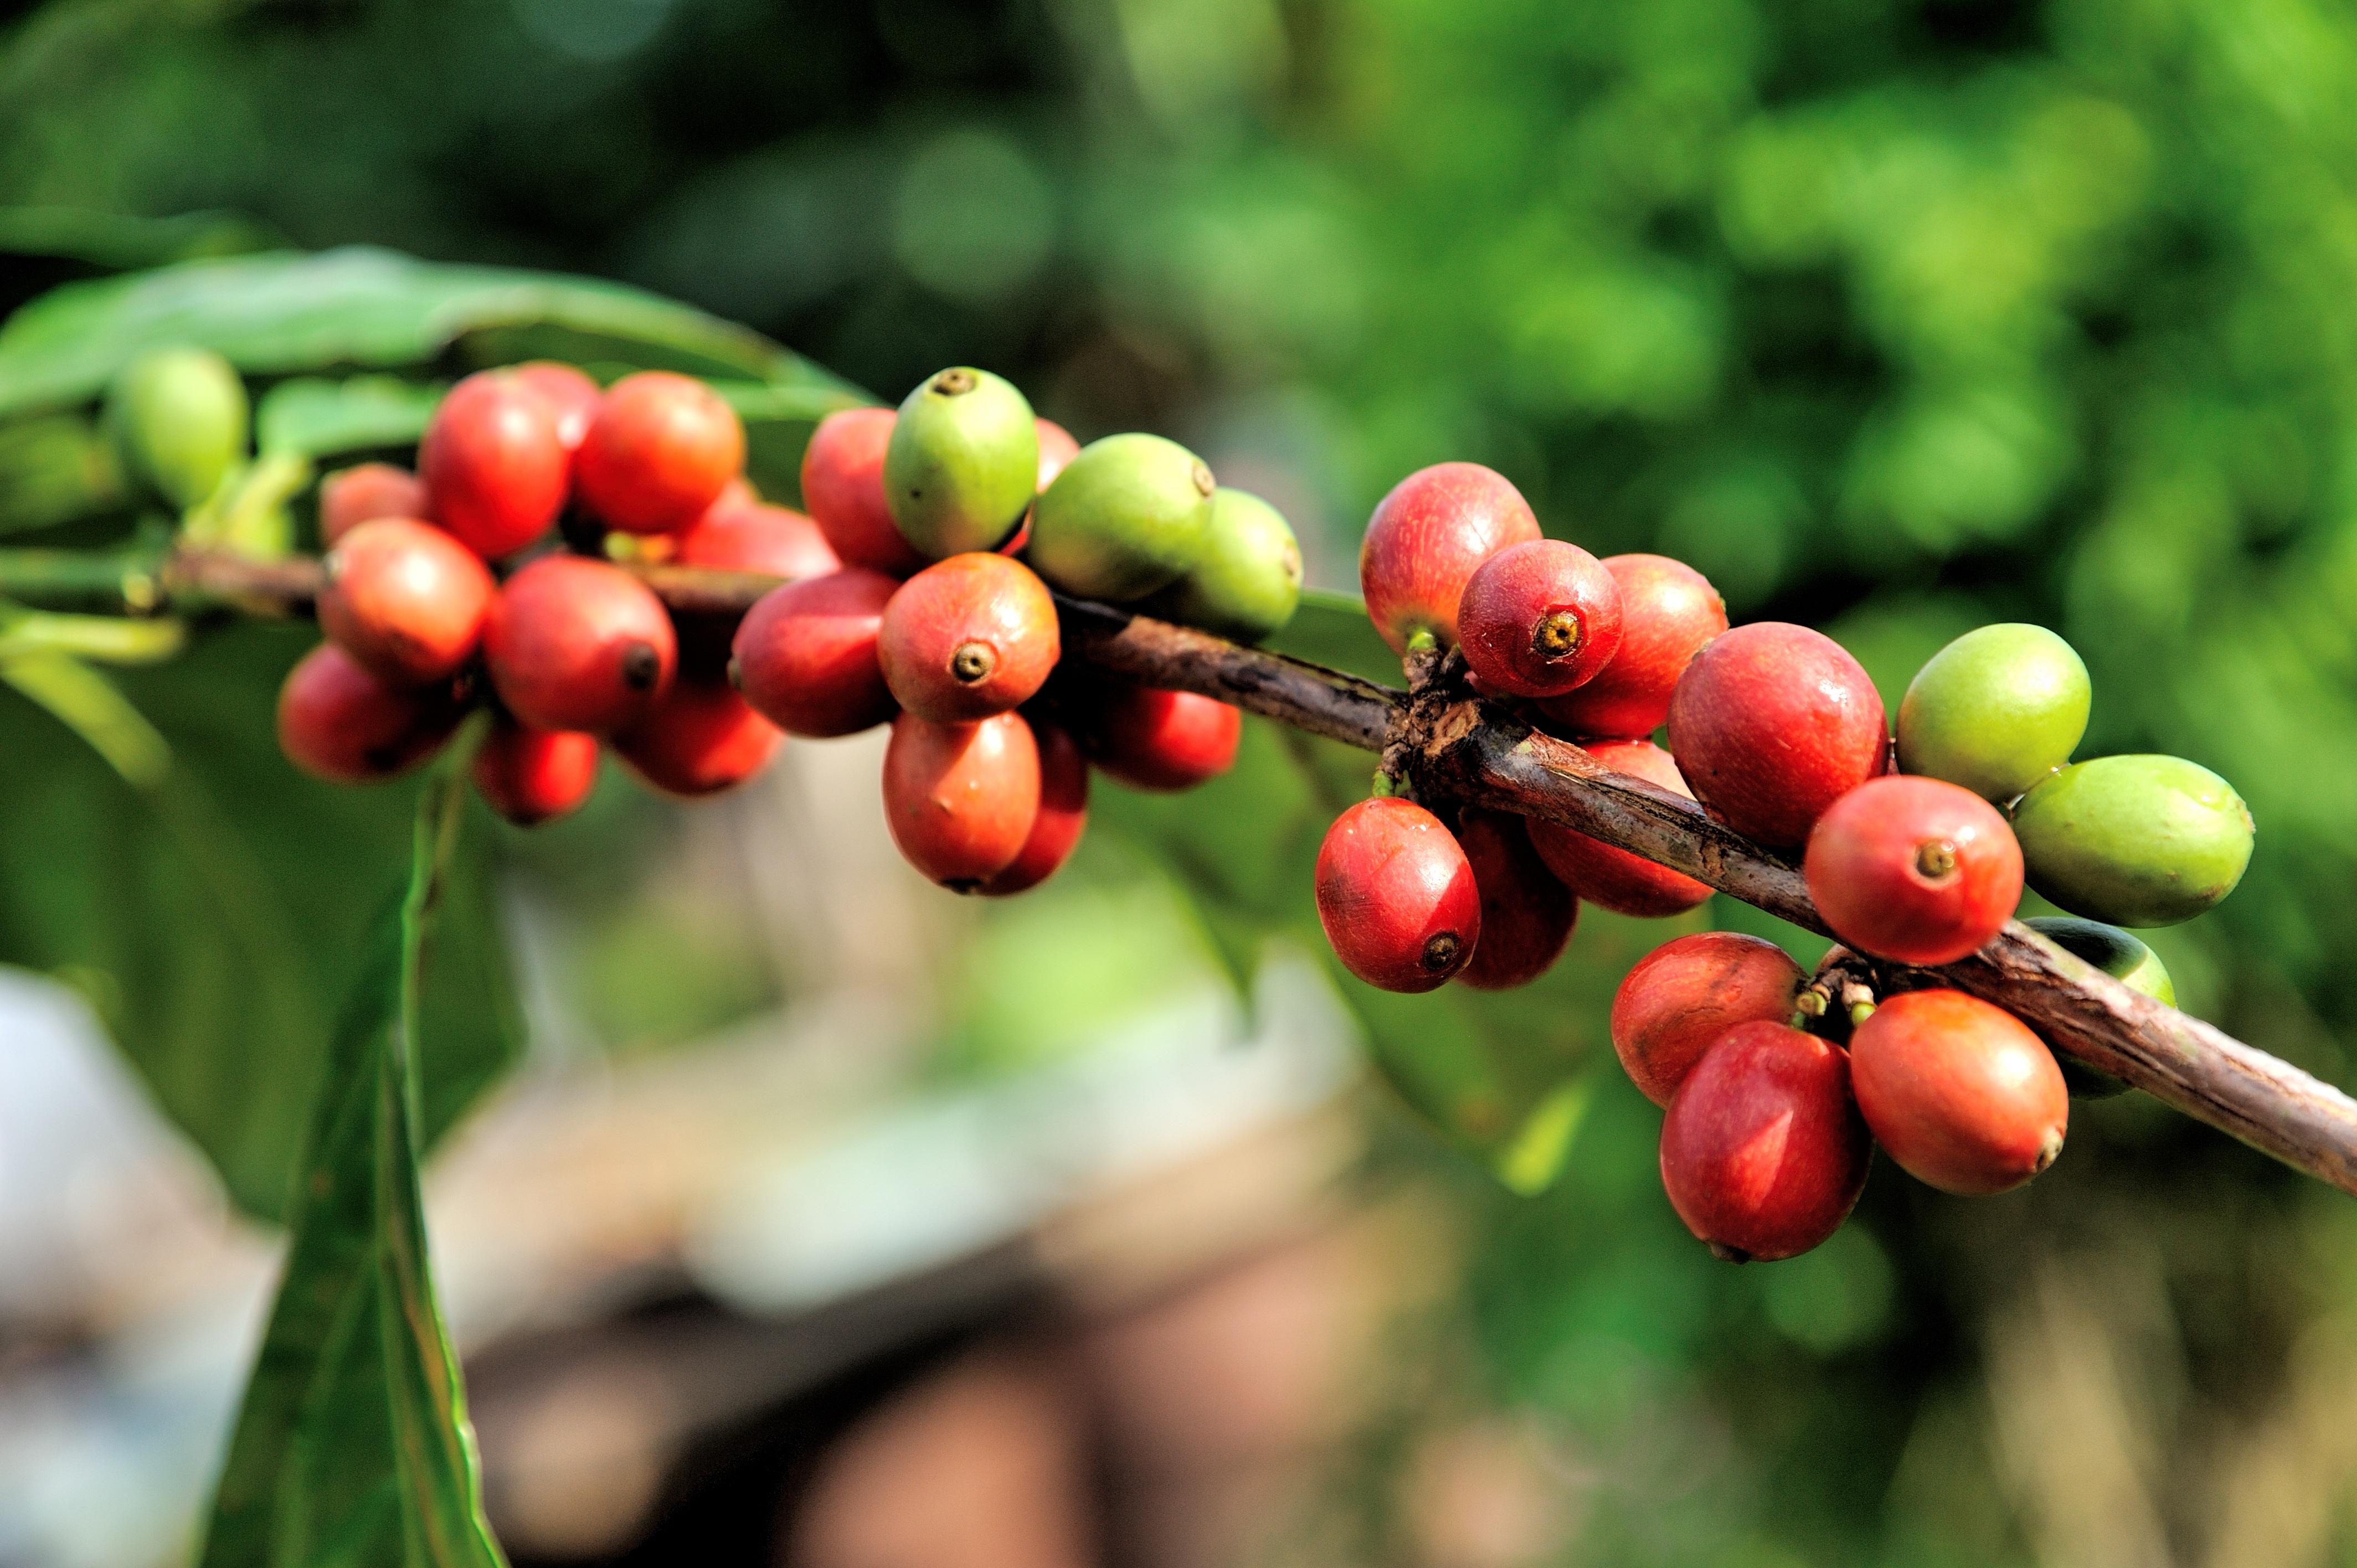 Best arabica coffee beans online